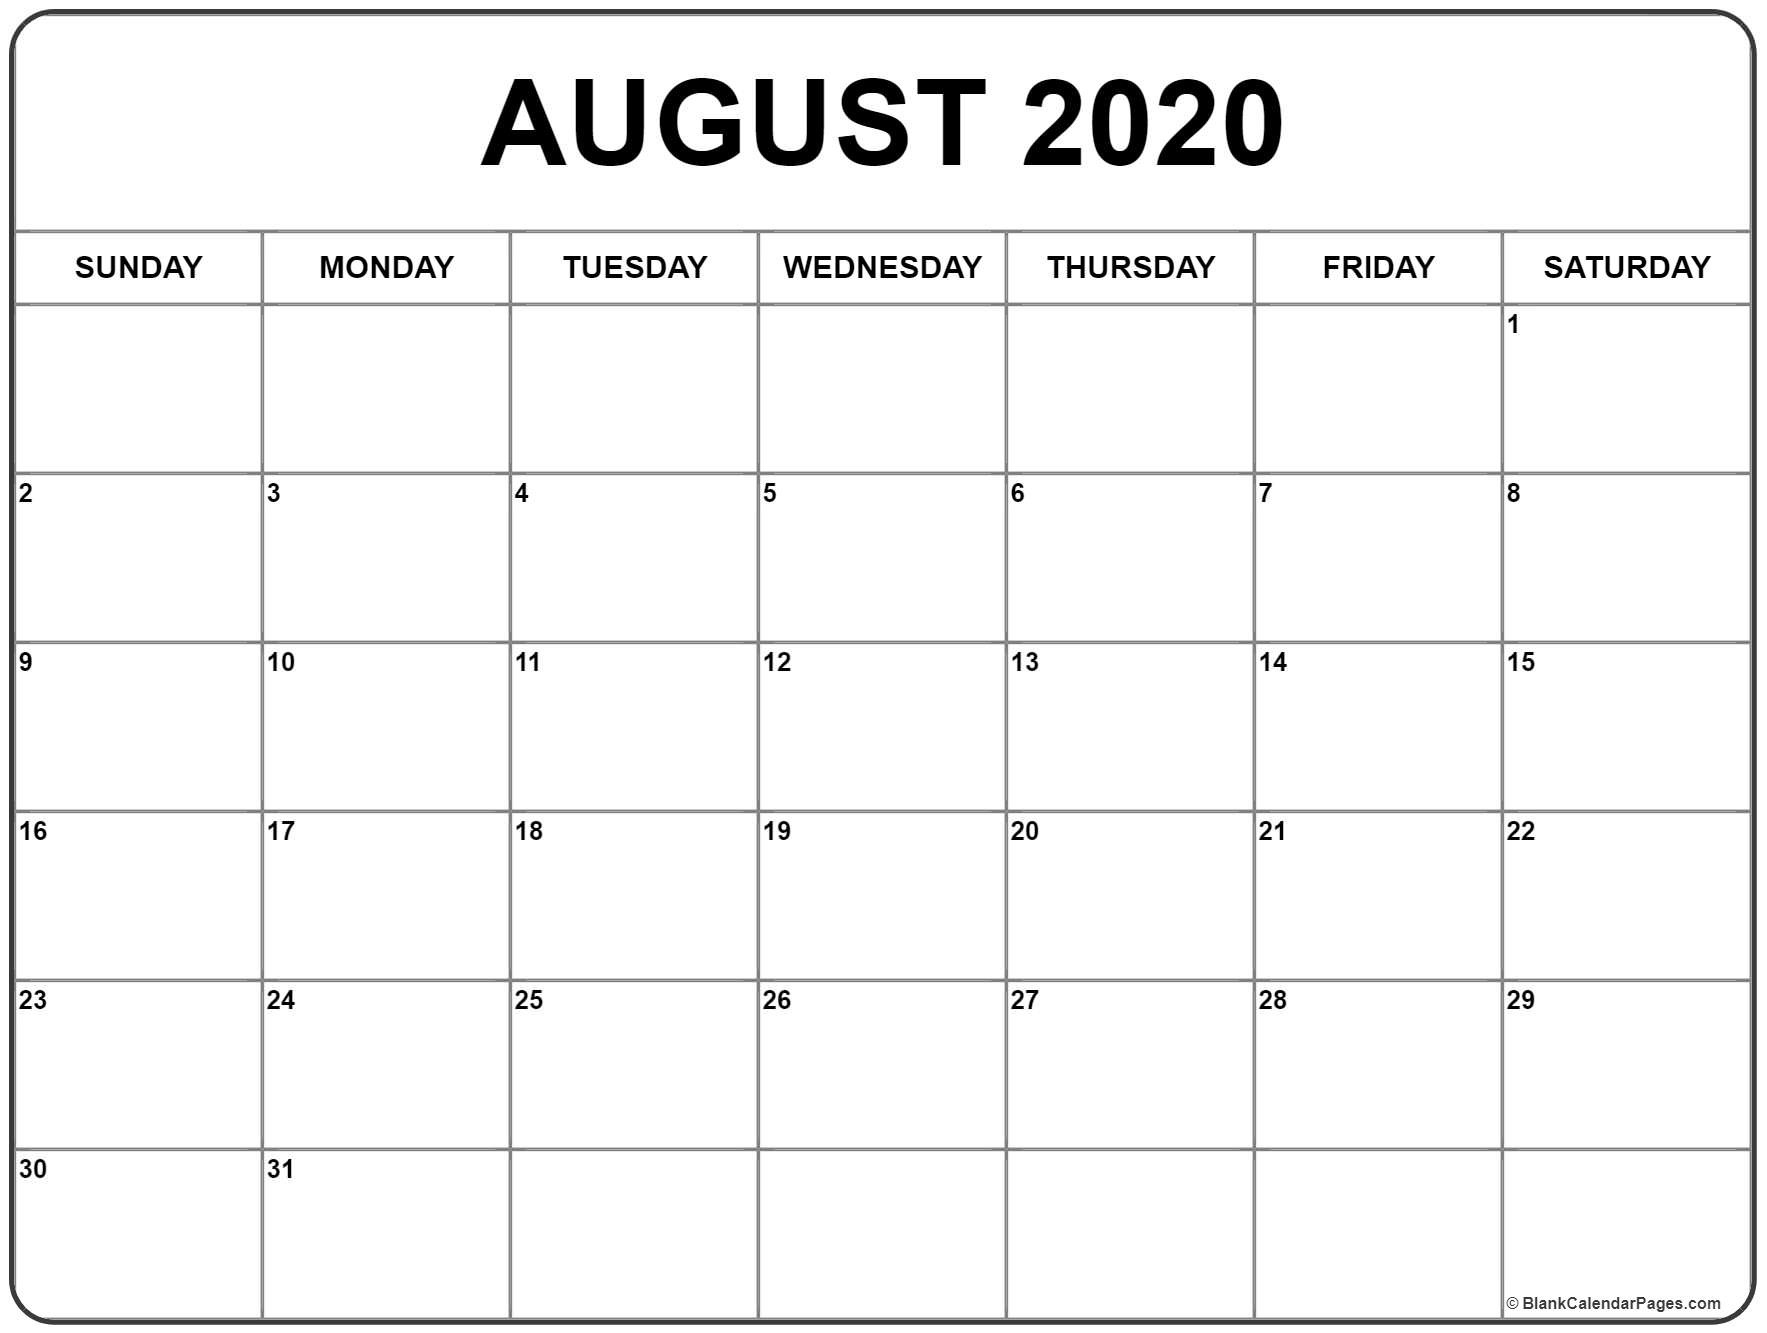 August 2020 Monthly Calendar Printable | Gallery Of Calendar